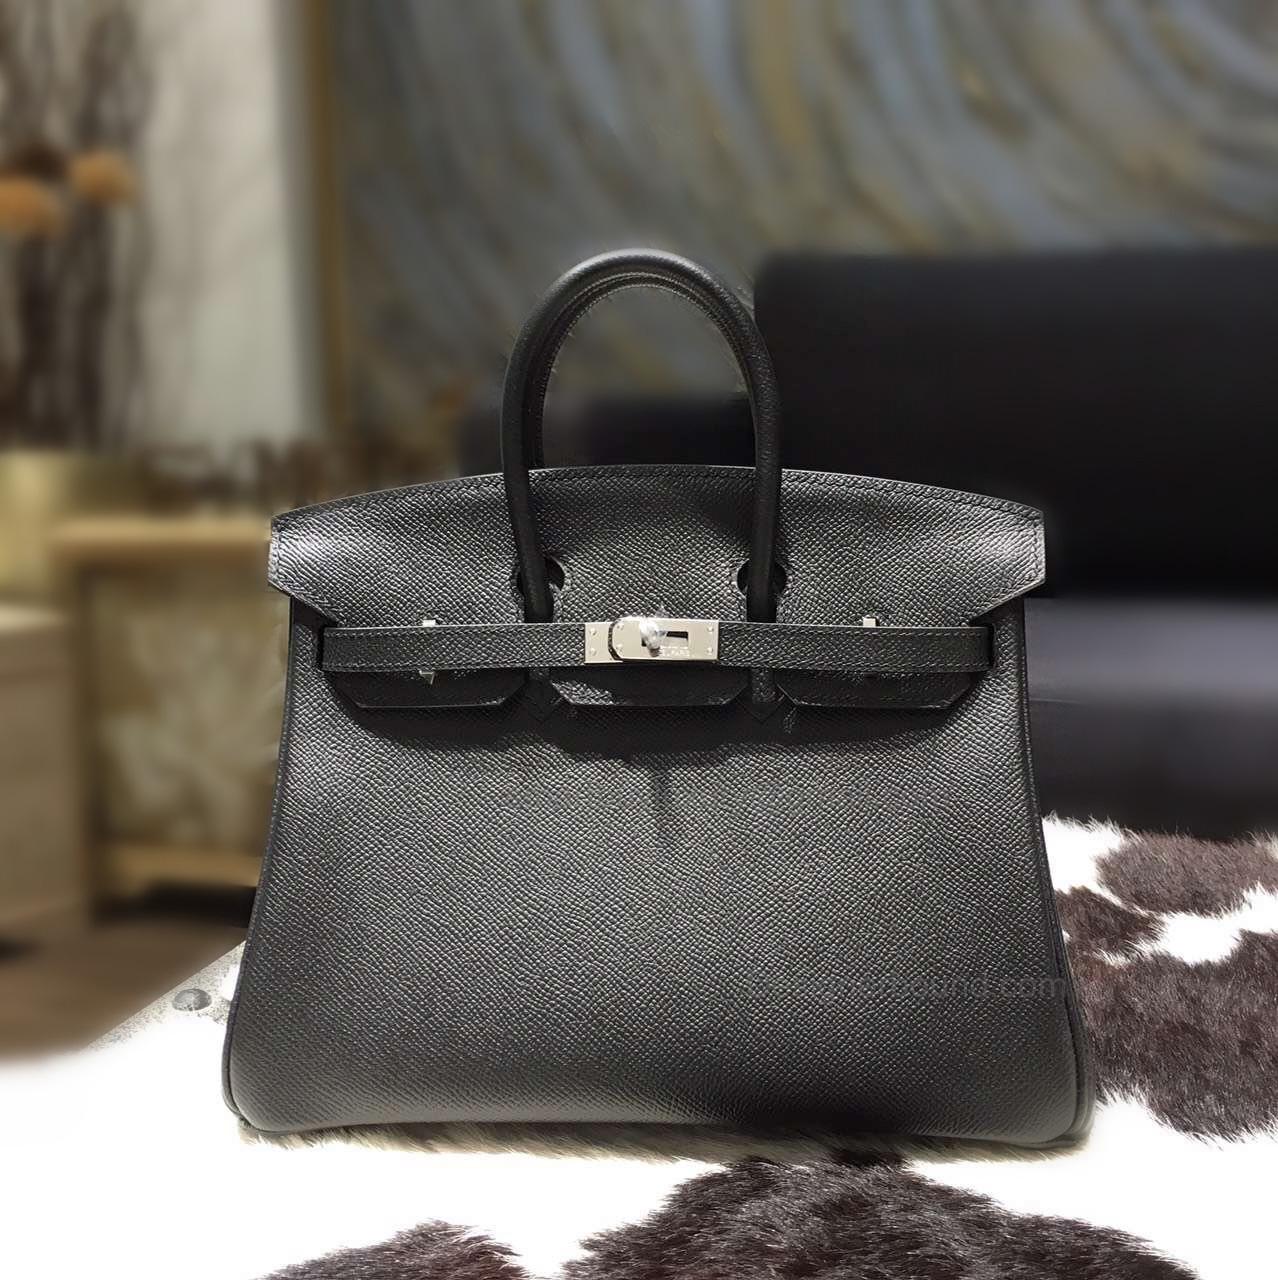 c353417344 Hand Stitched Hermes Birkin 25 Bag in ck89 Noir Epsom Calfskin SHW